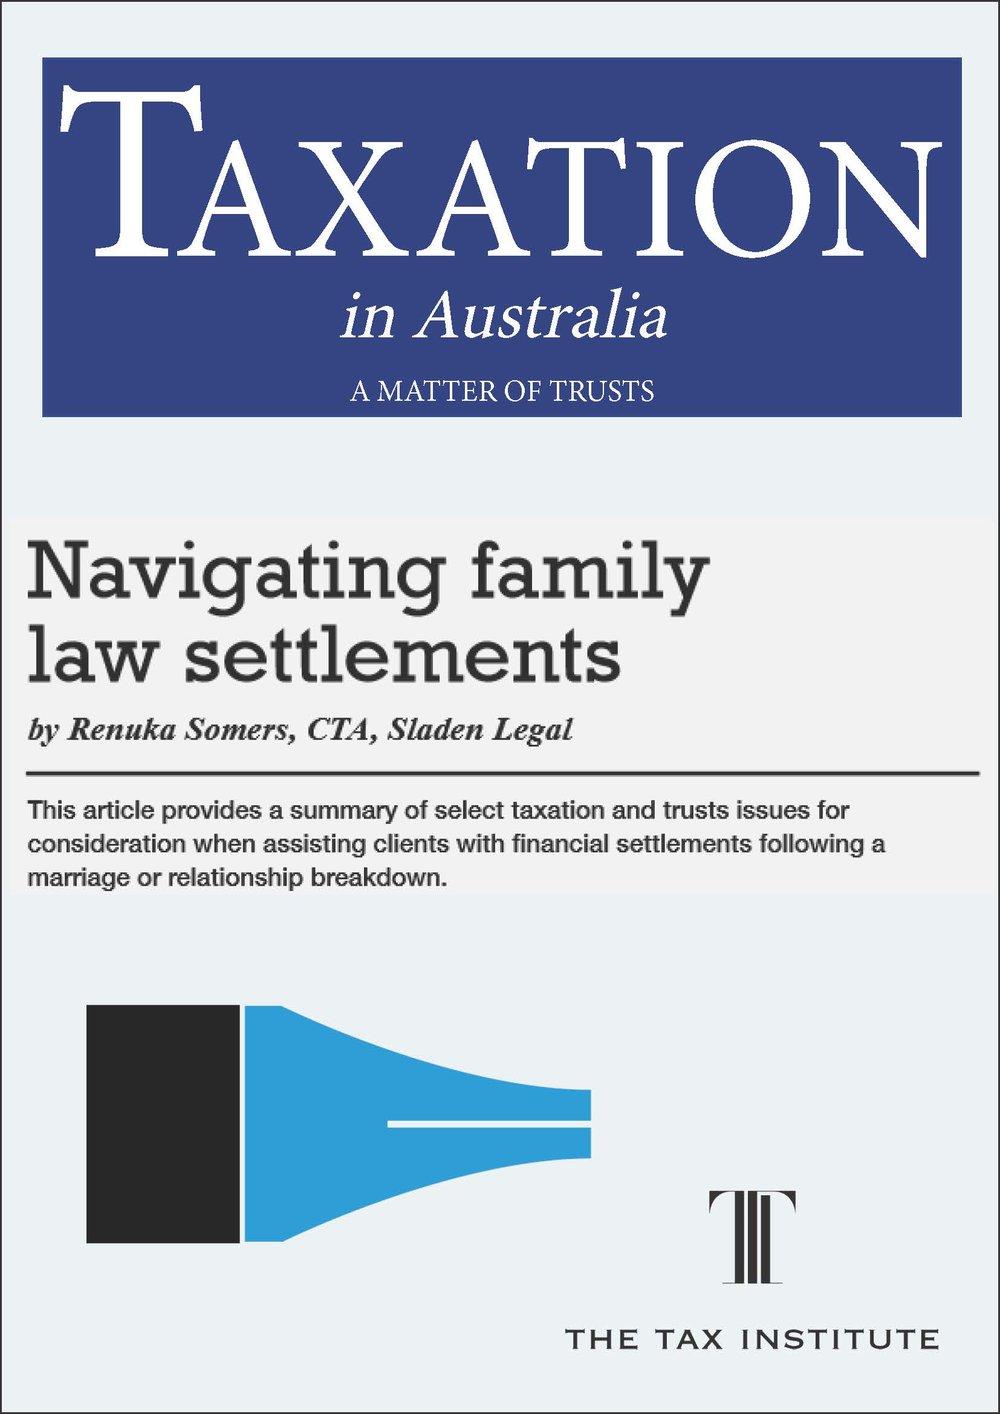 Navigating family law settlements 05 February 2015